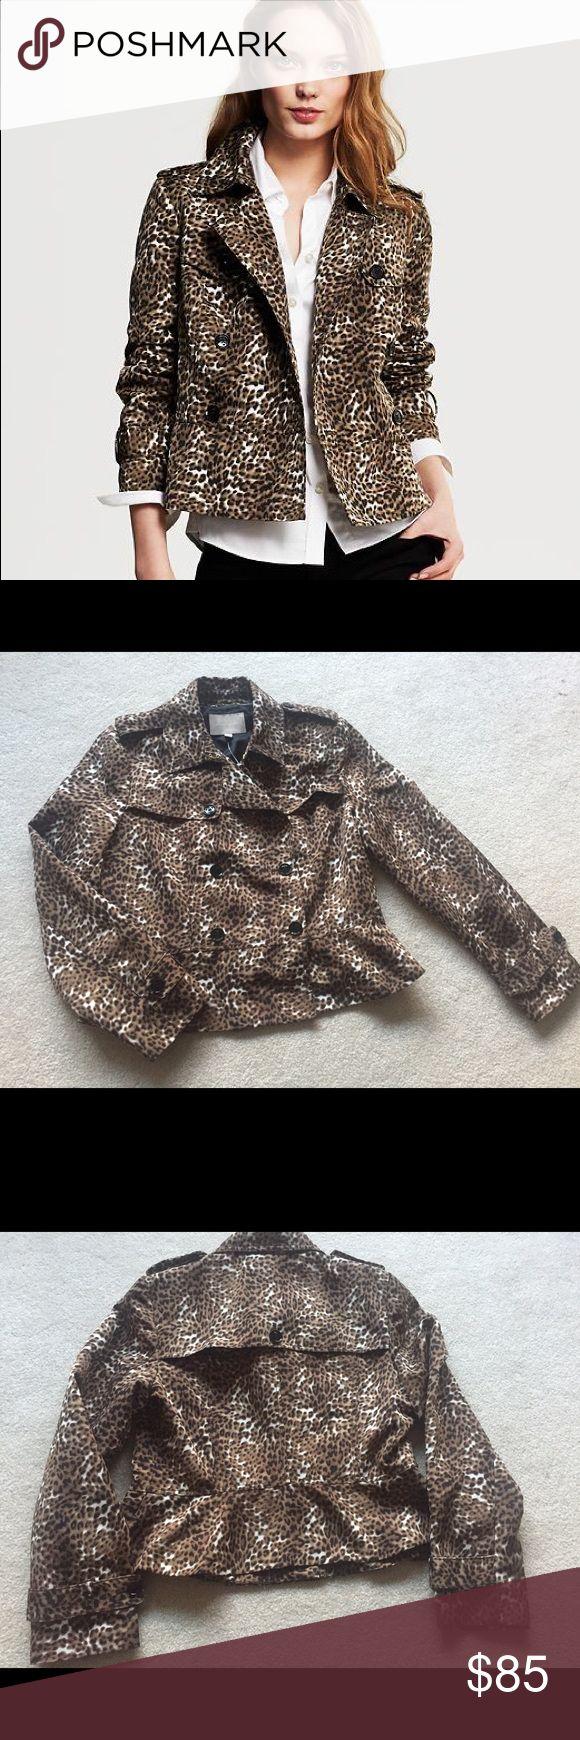 Banana Republic Leopard Print Short Trench Coat New without tags - never worn! Beautiful coat! Banana Republic Jackets & Coats